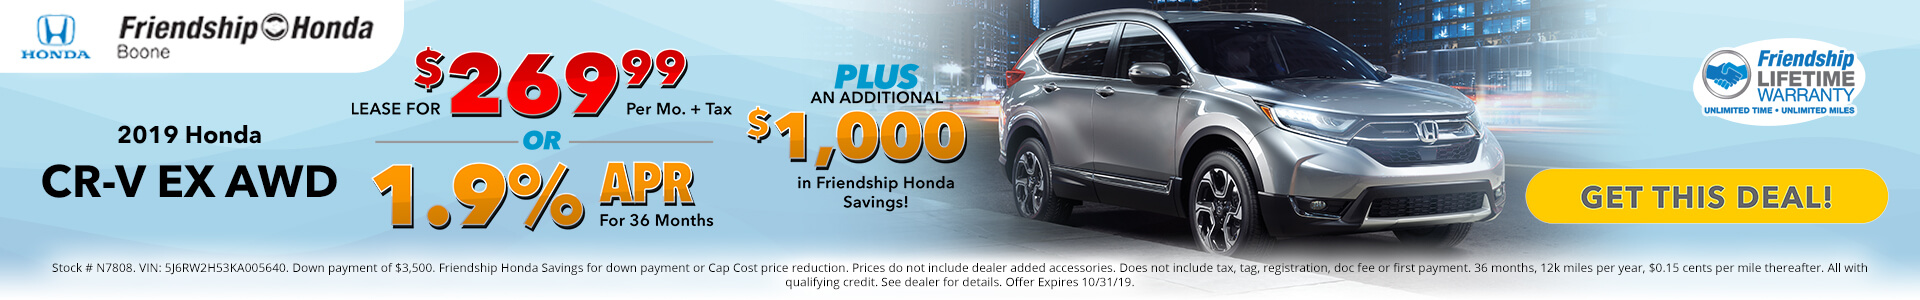 Honda CR-V EX $269.99 Lease